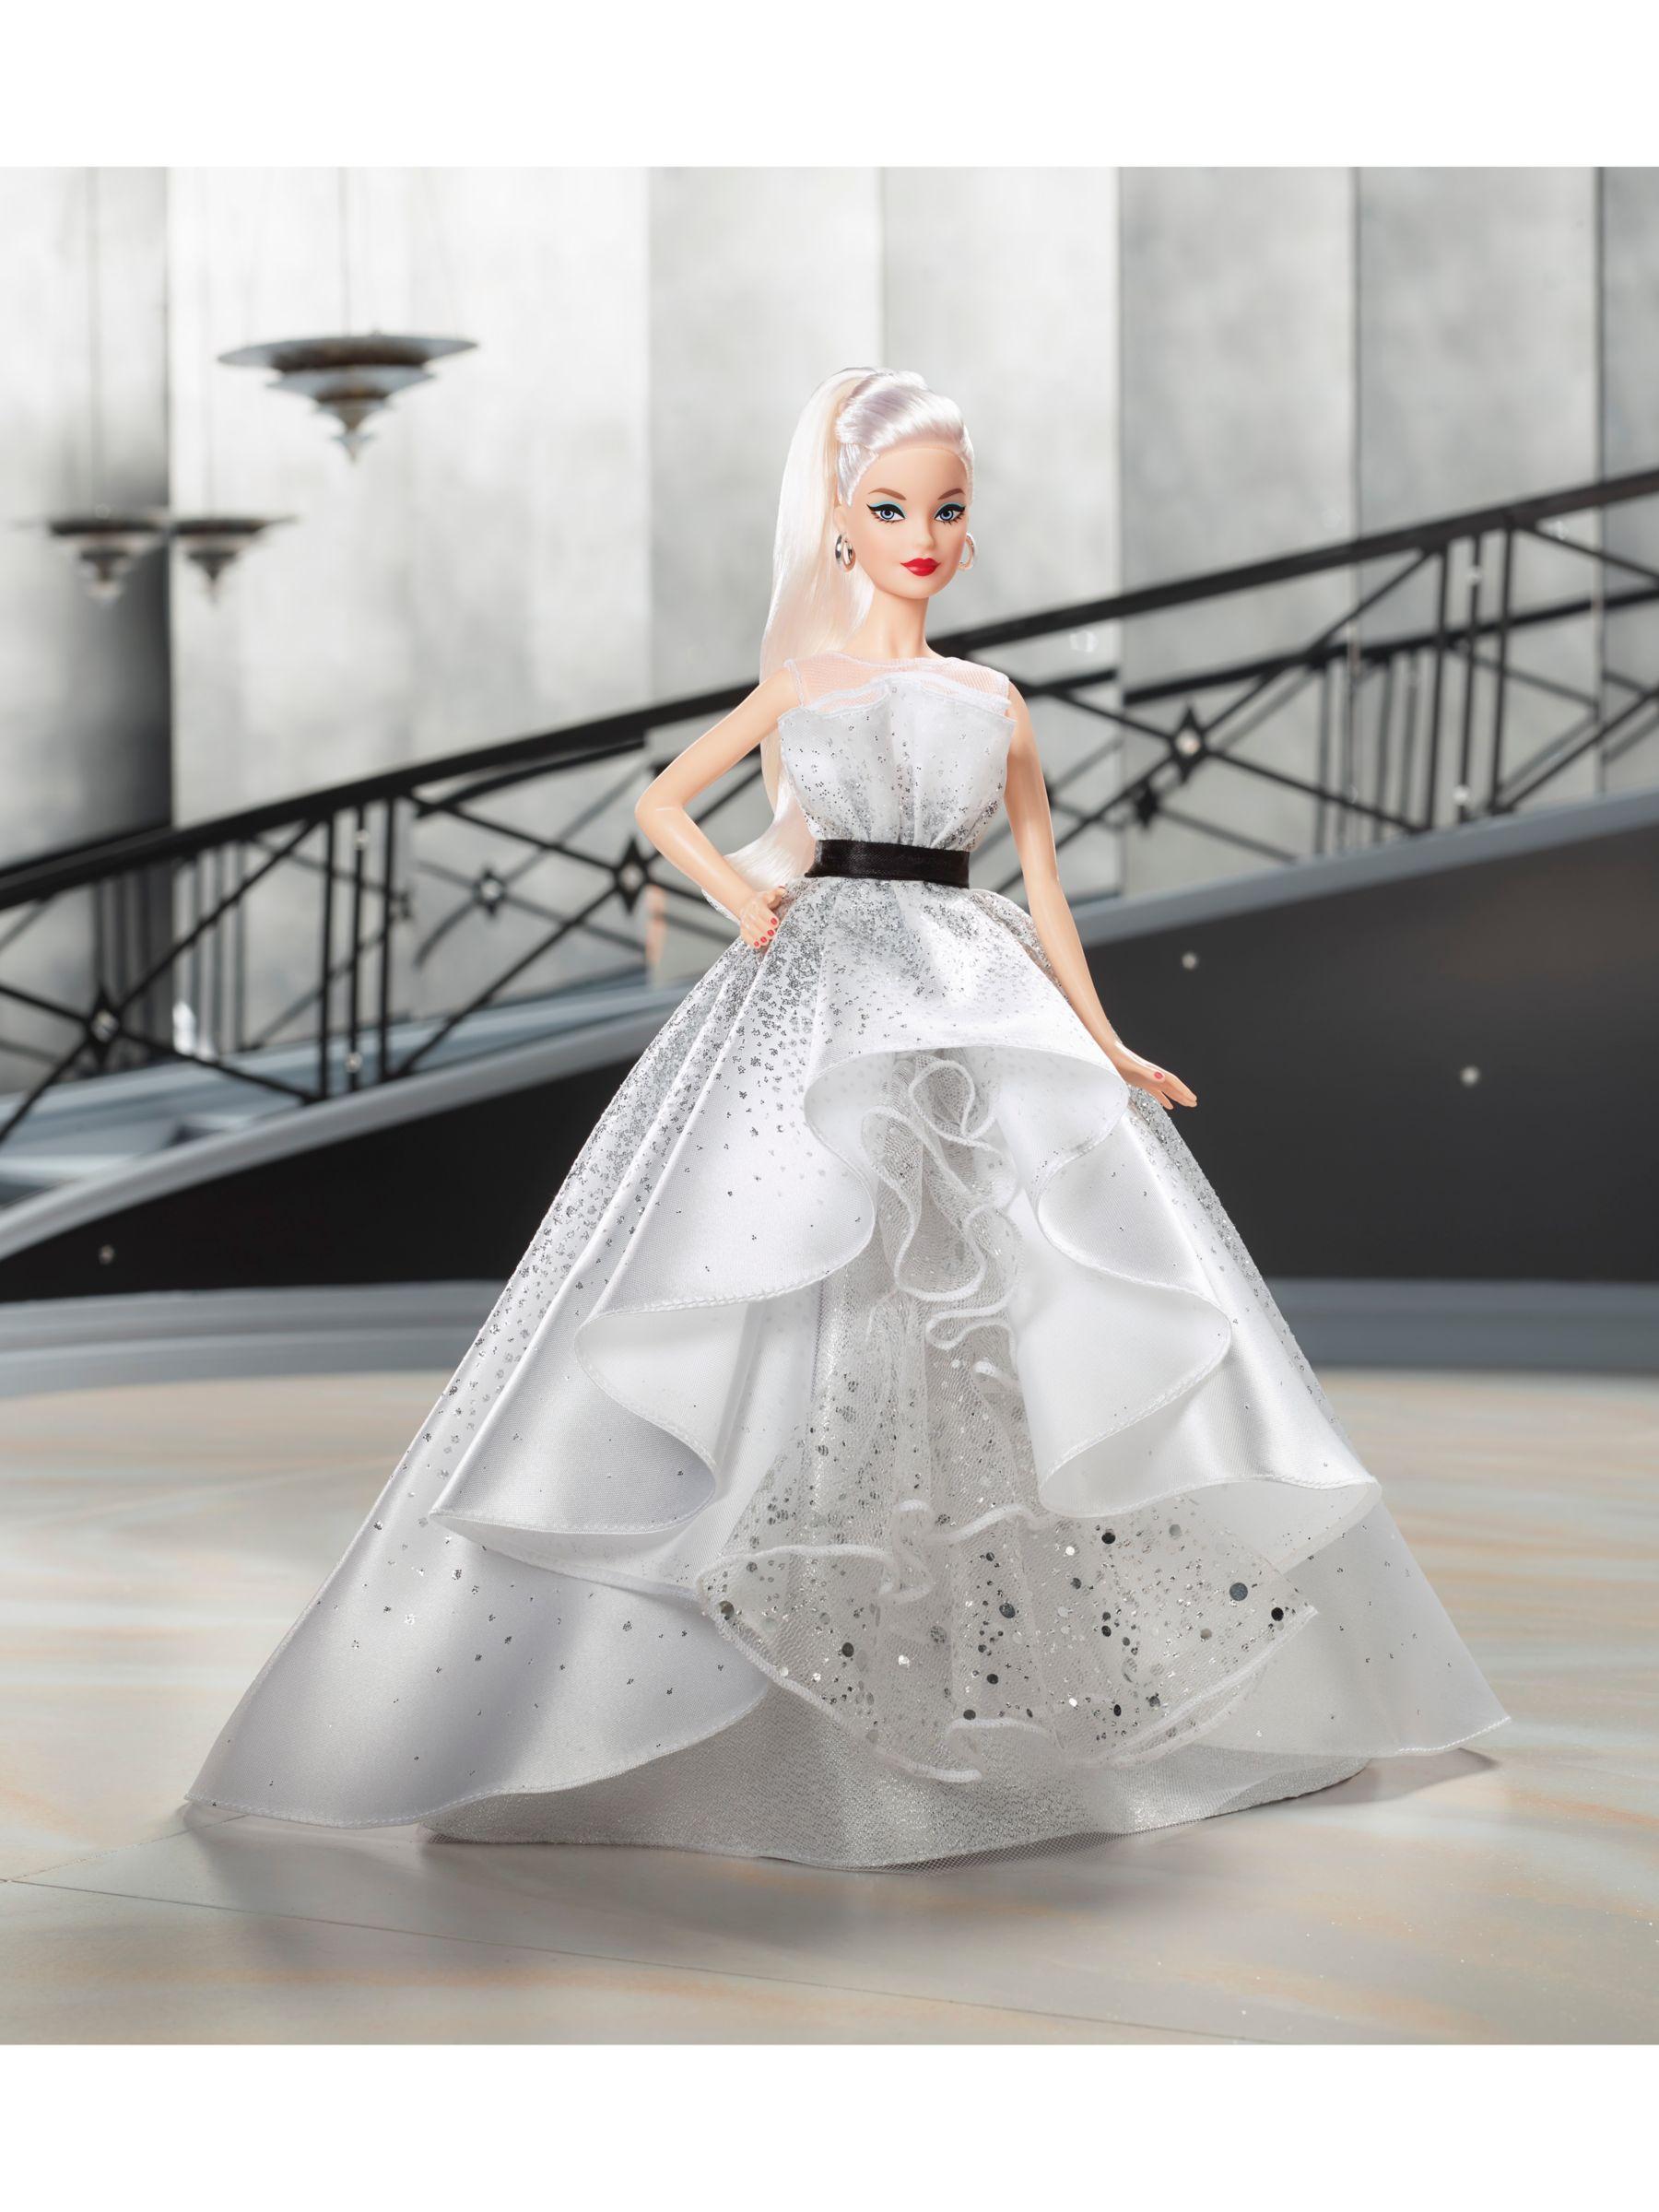 Barbie Barbie 60th Anniversary Celebration Doll